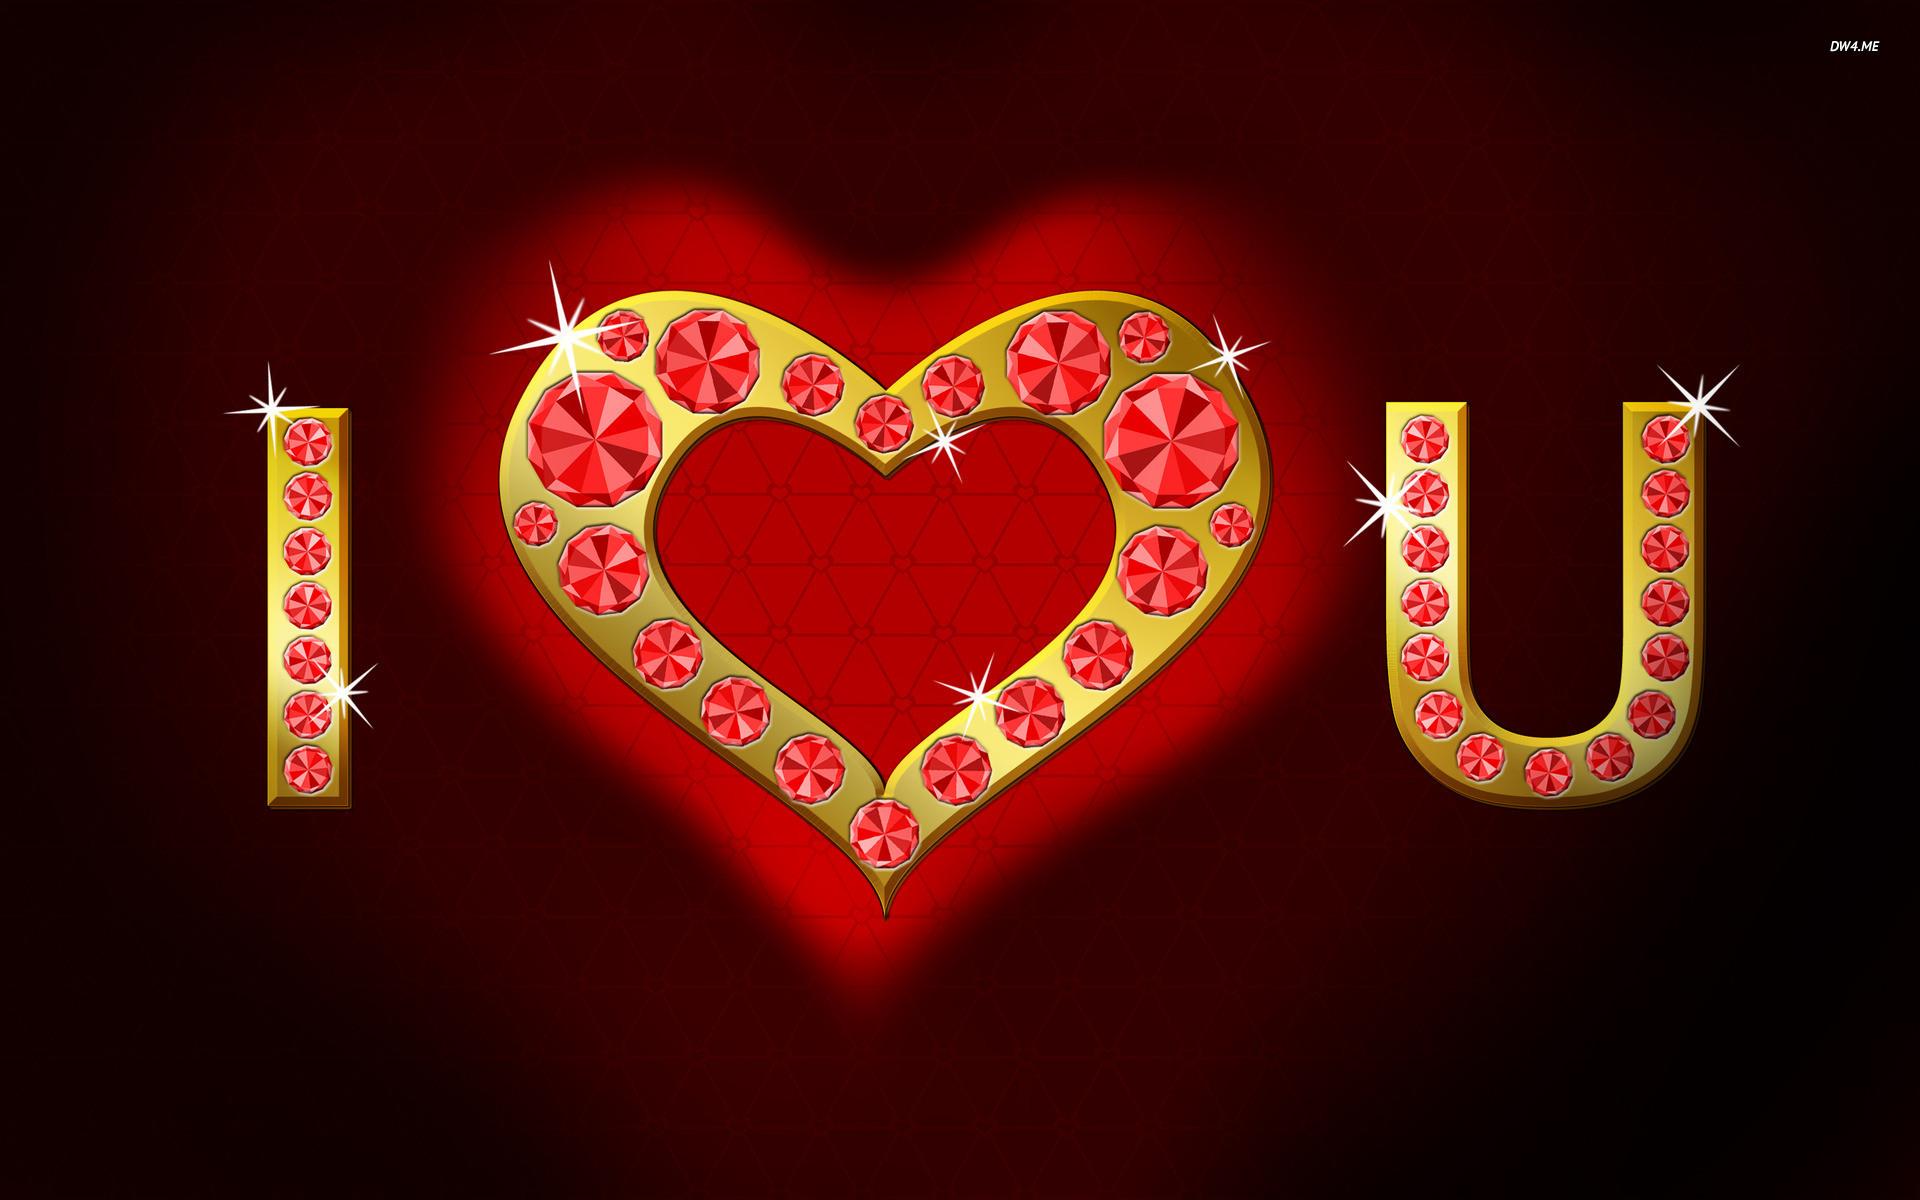 I Love You Forever Windows - Love U Sms - HD Wallpaper